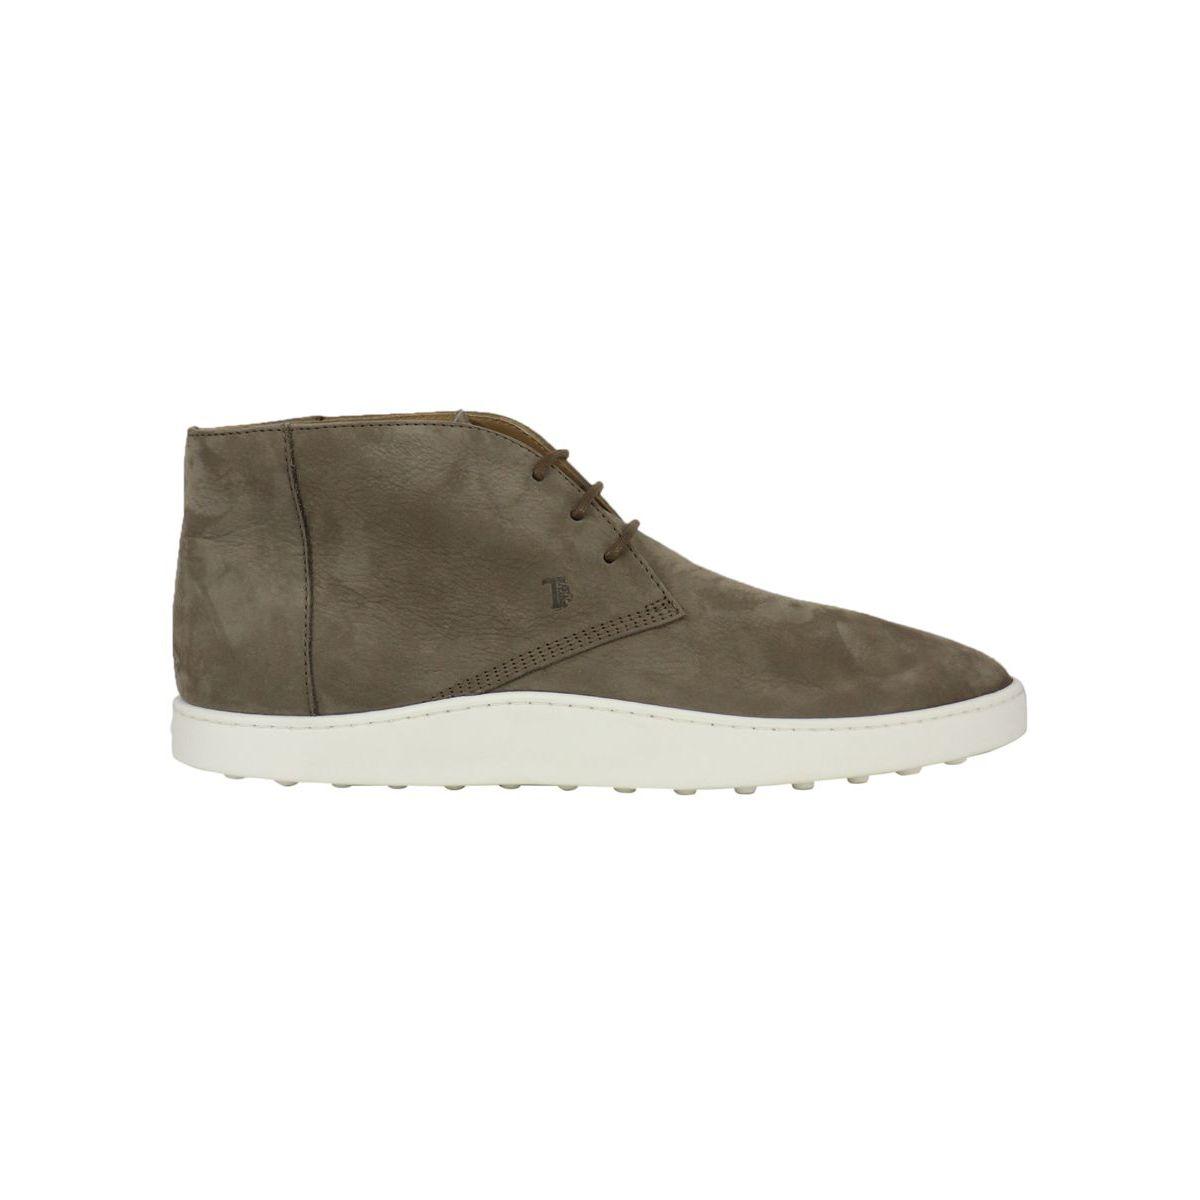 Ankle boot FONDO 52B CASSETTA Tortora Tod's